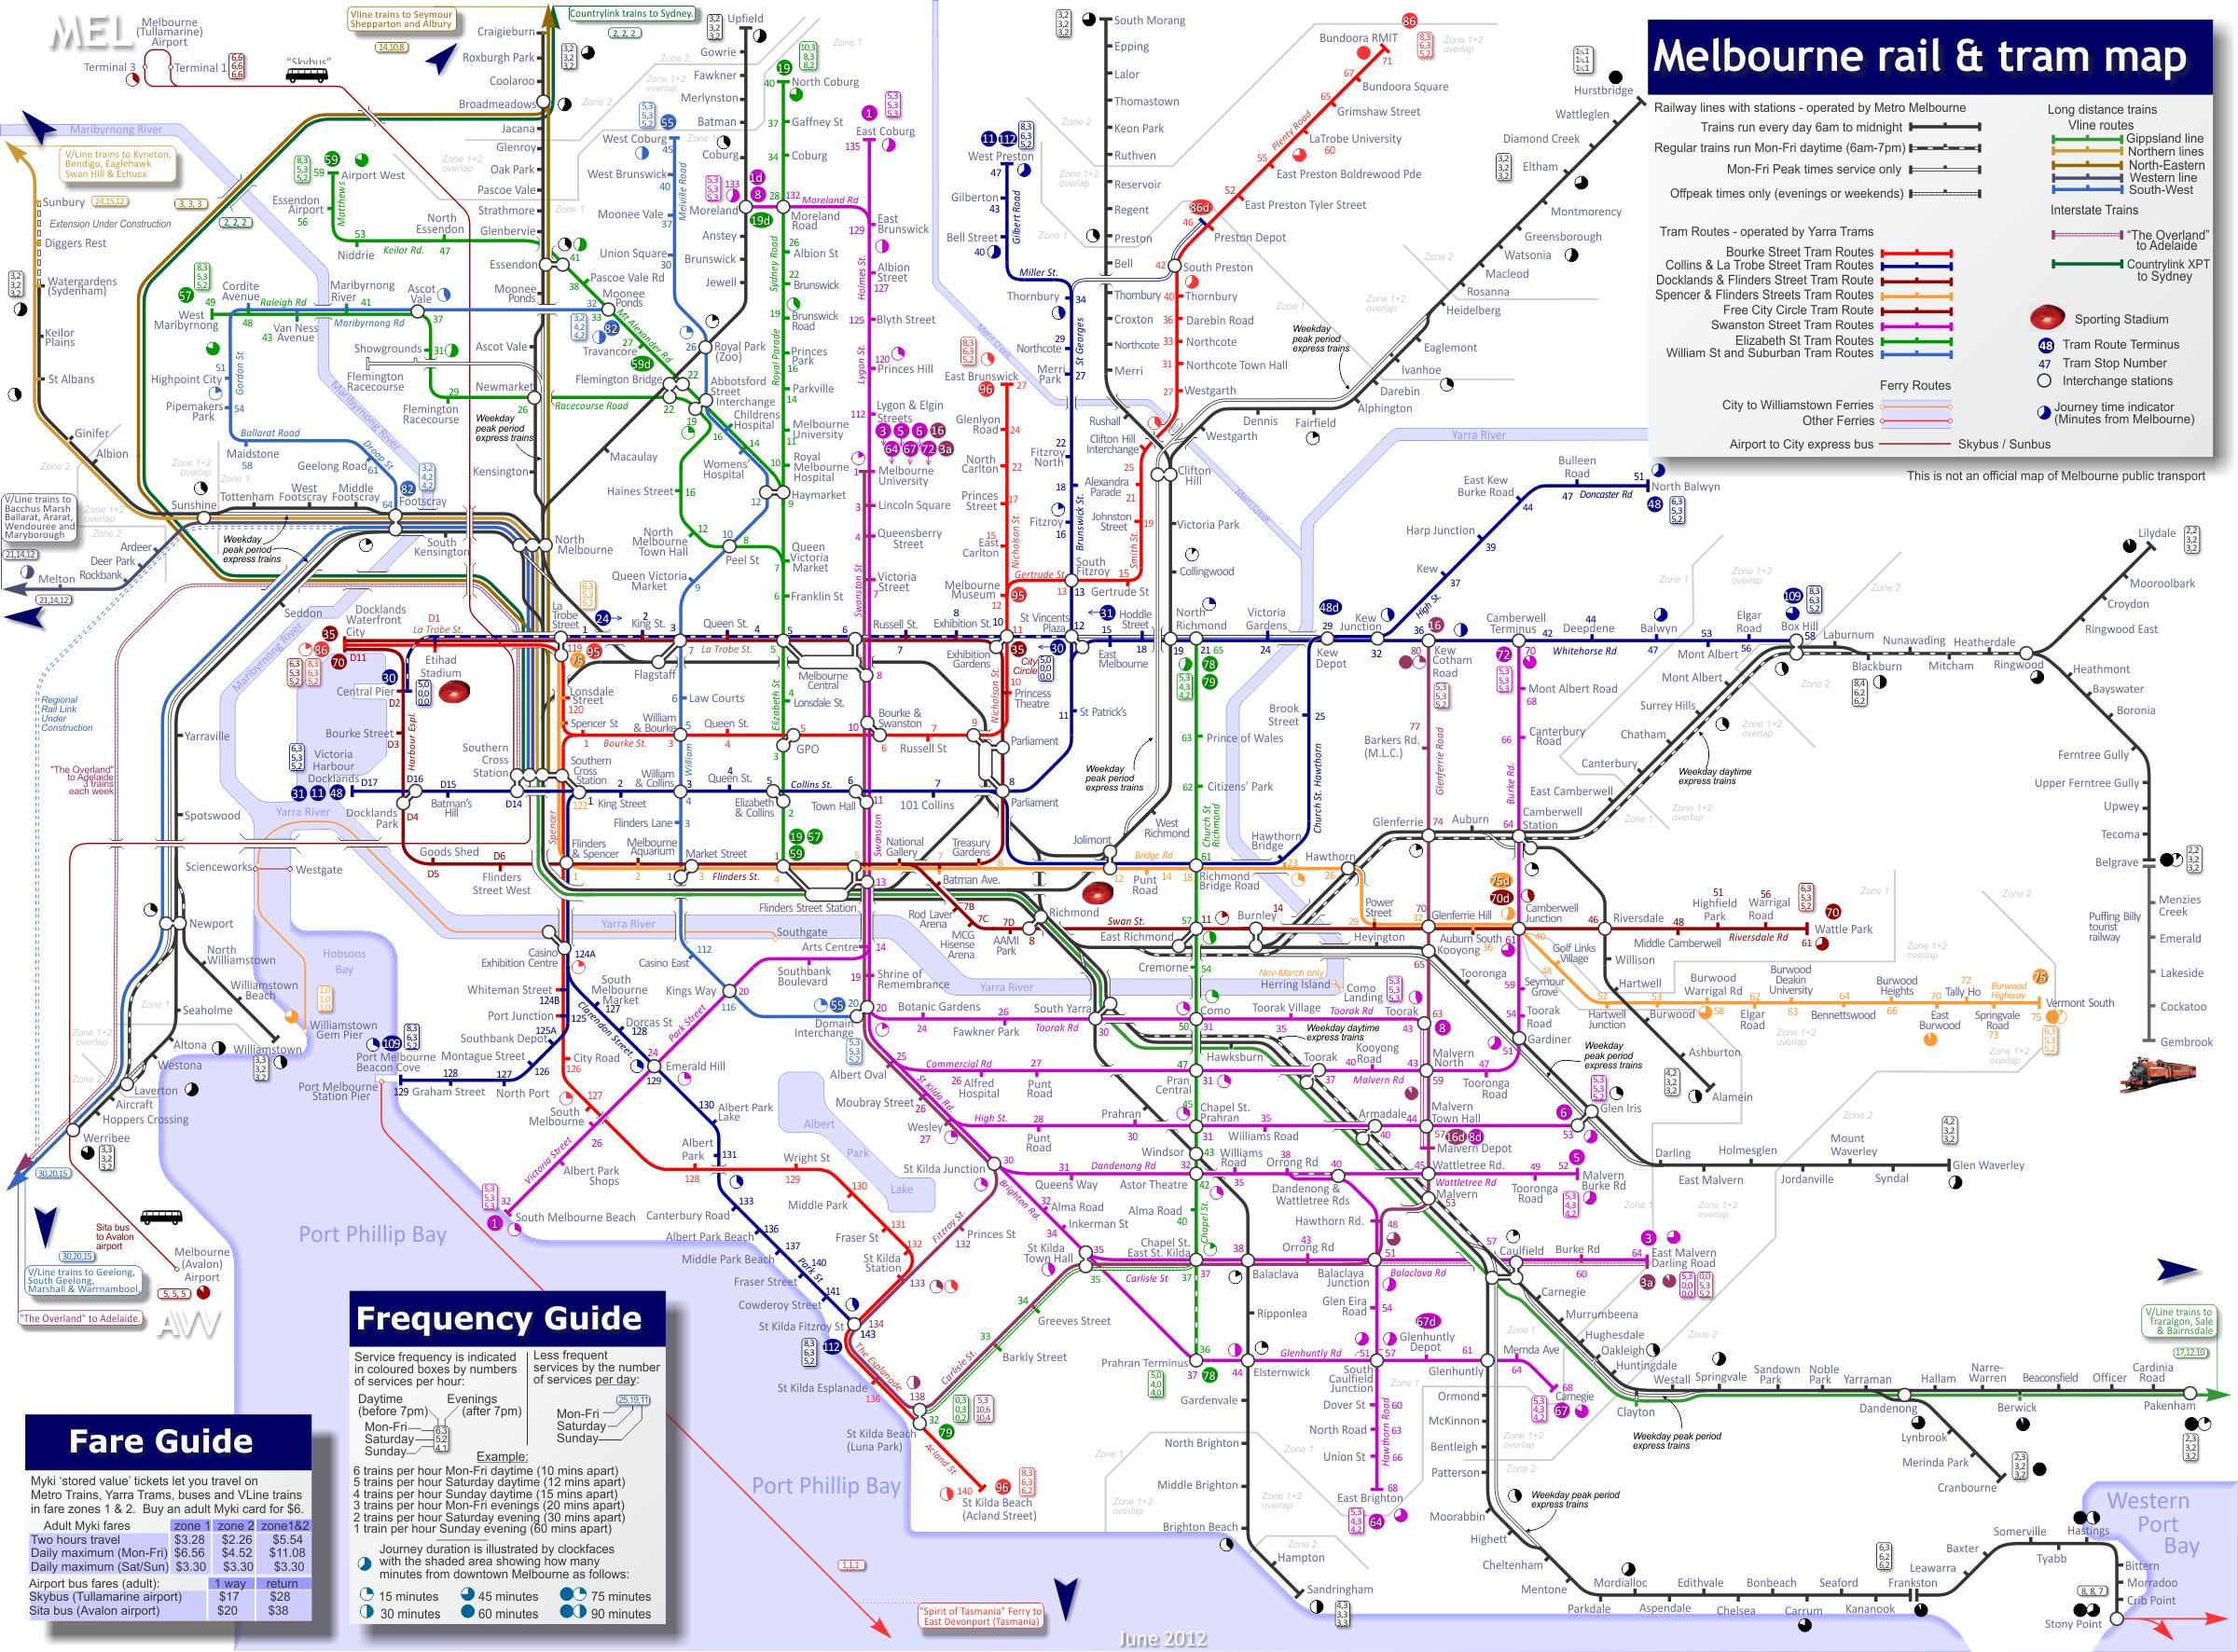 MELBOURNE Train Tram map Melbourne Pinterest Melbourne